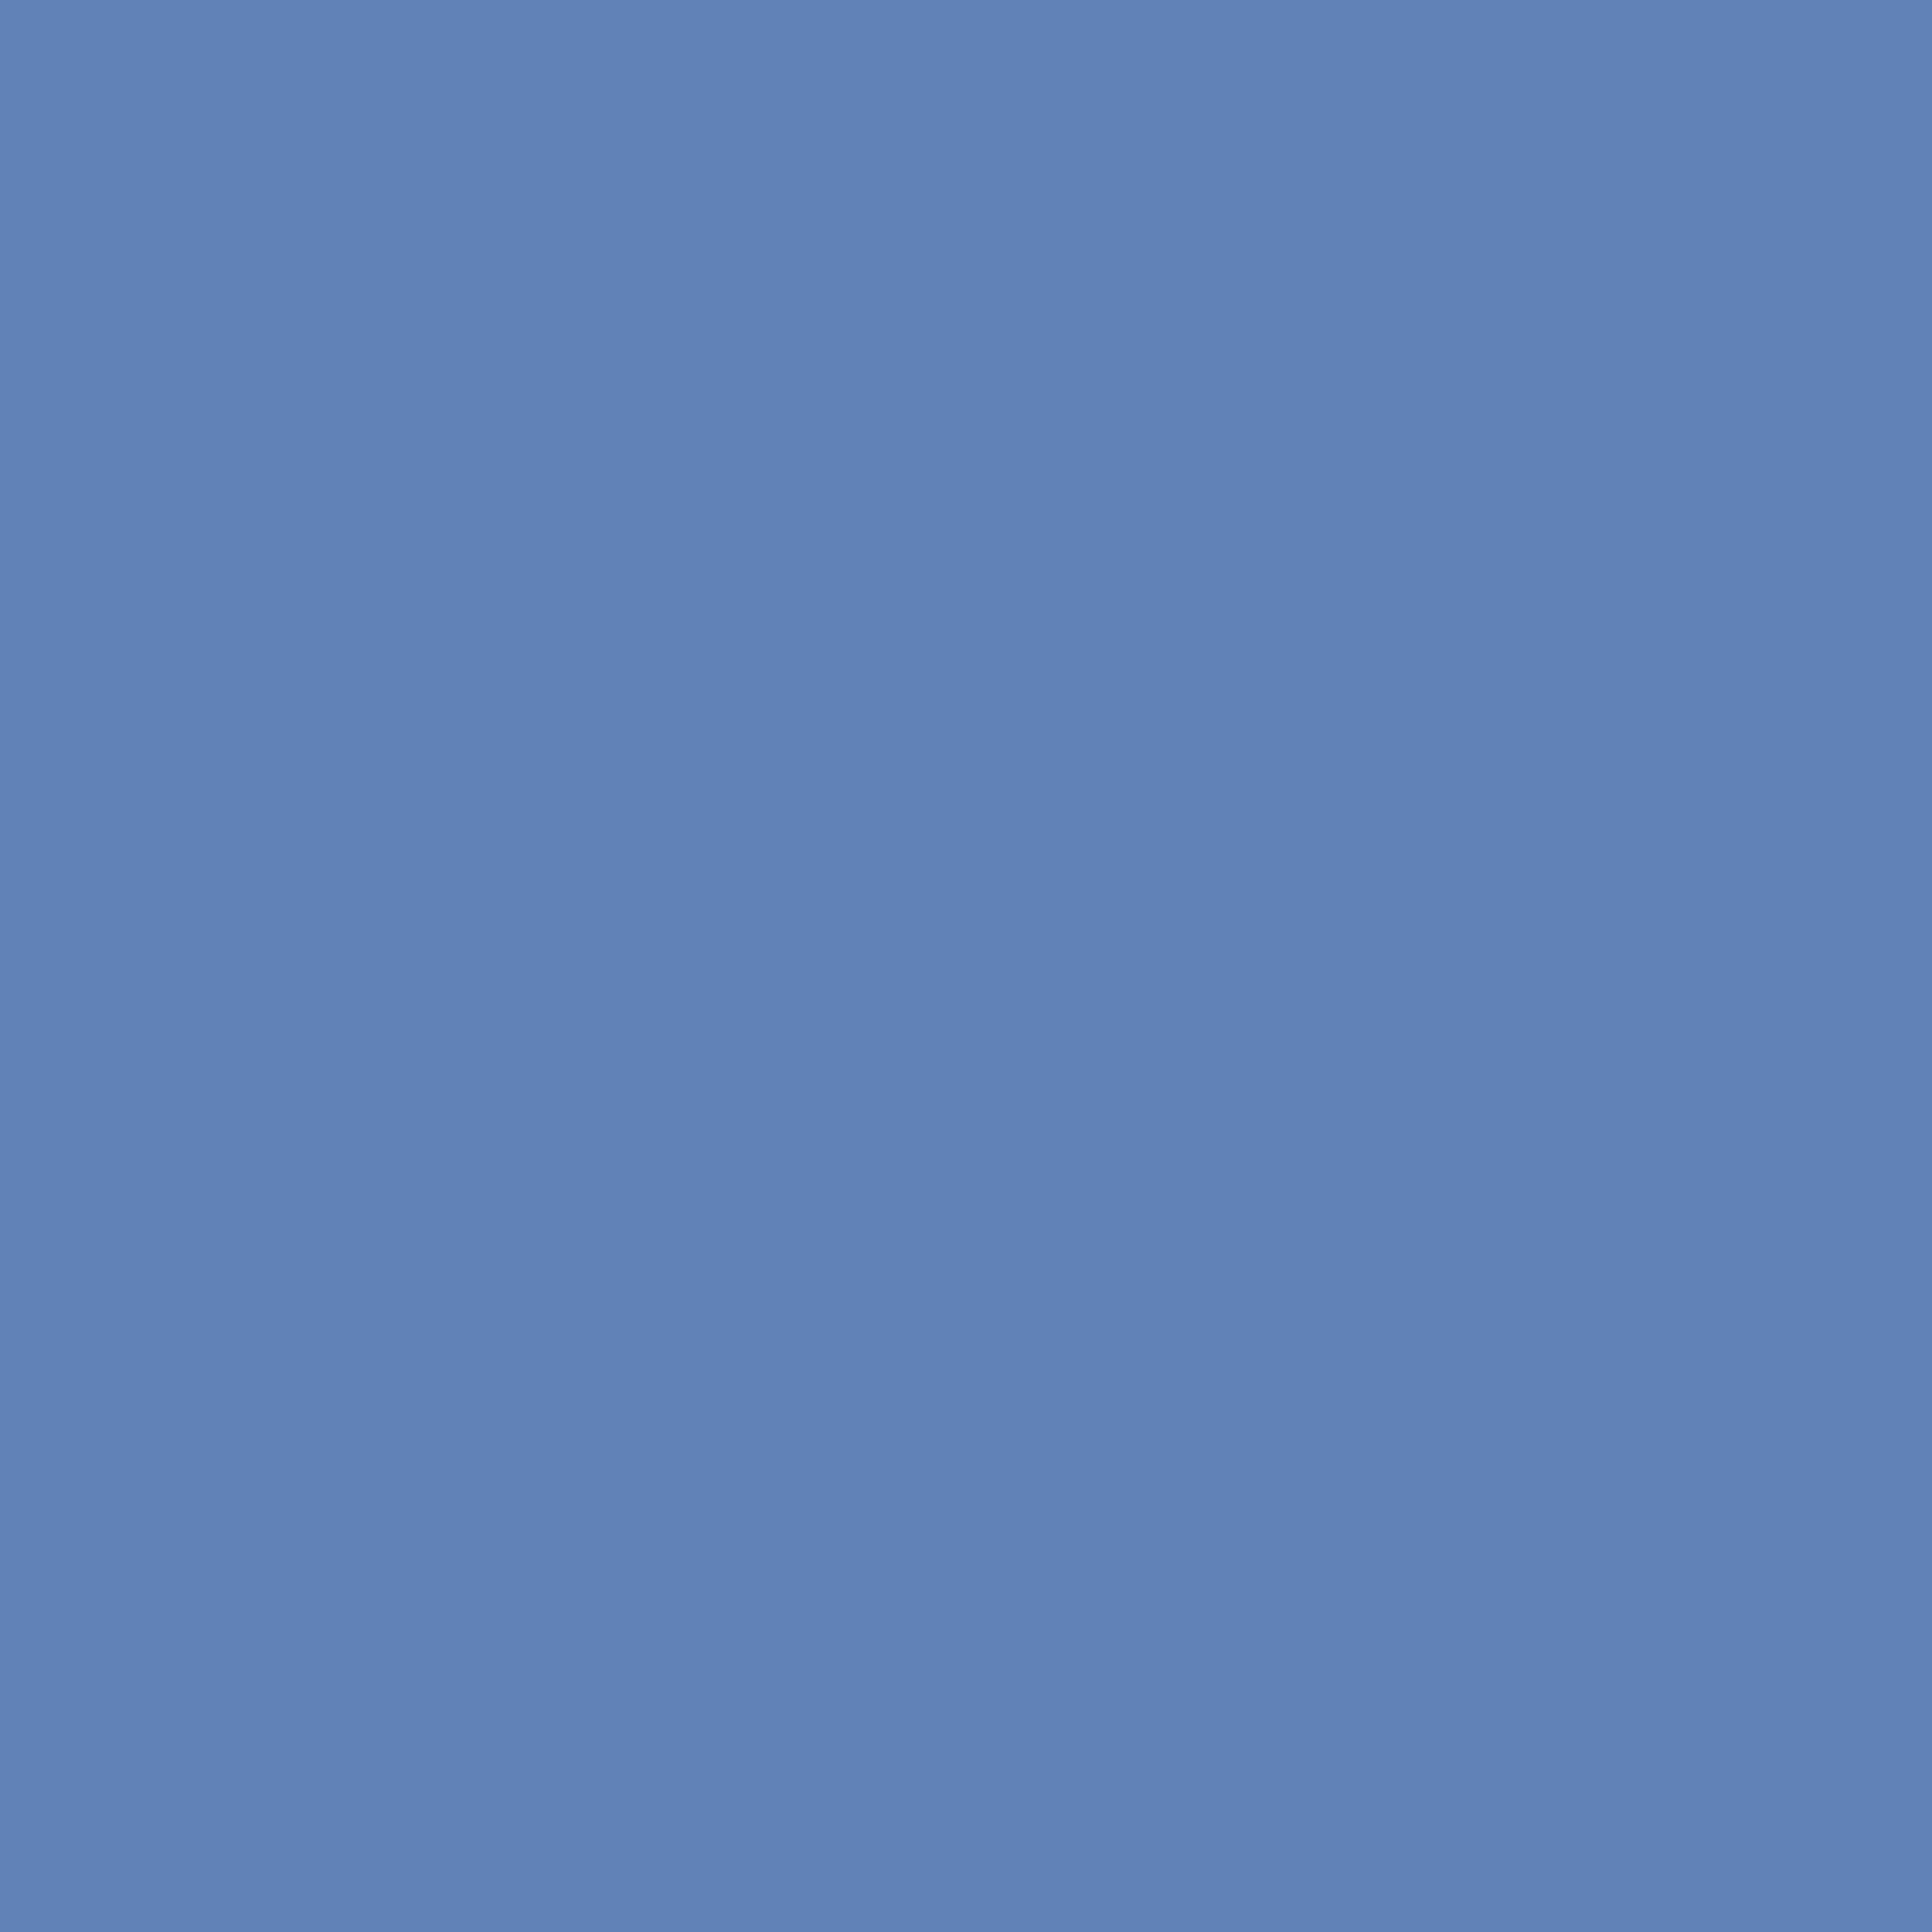 2732x2732 Glaucous Solid Color Background